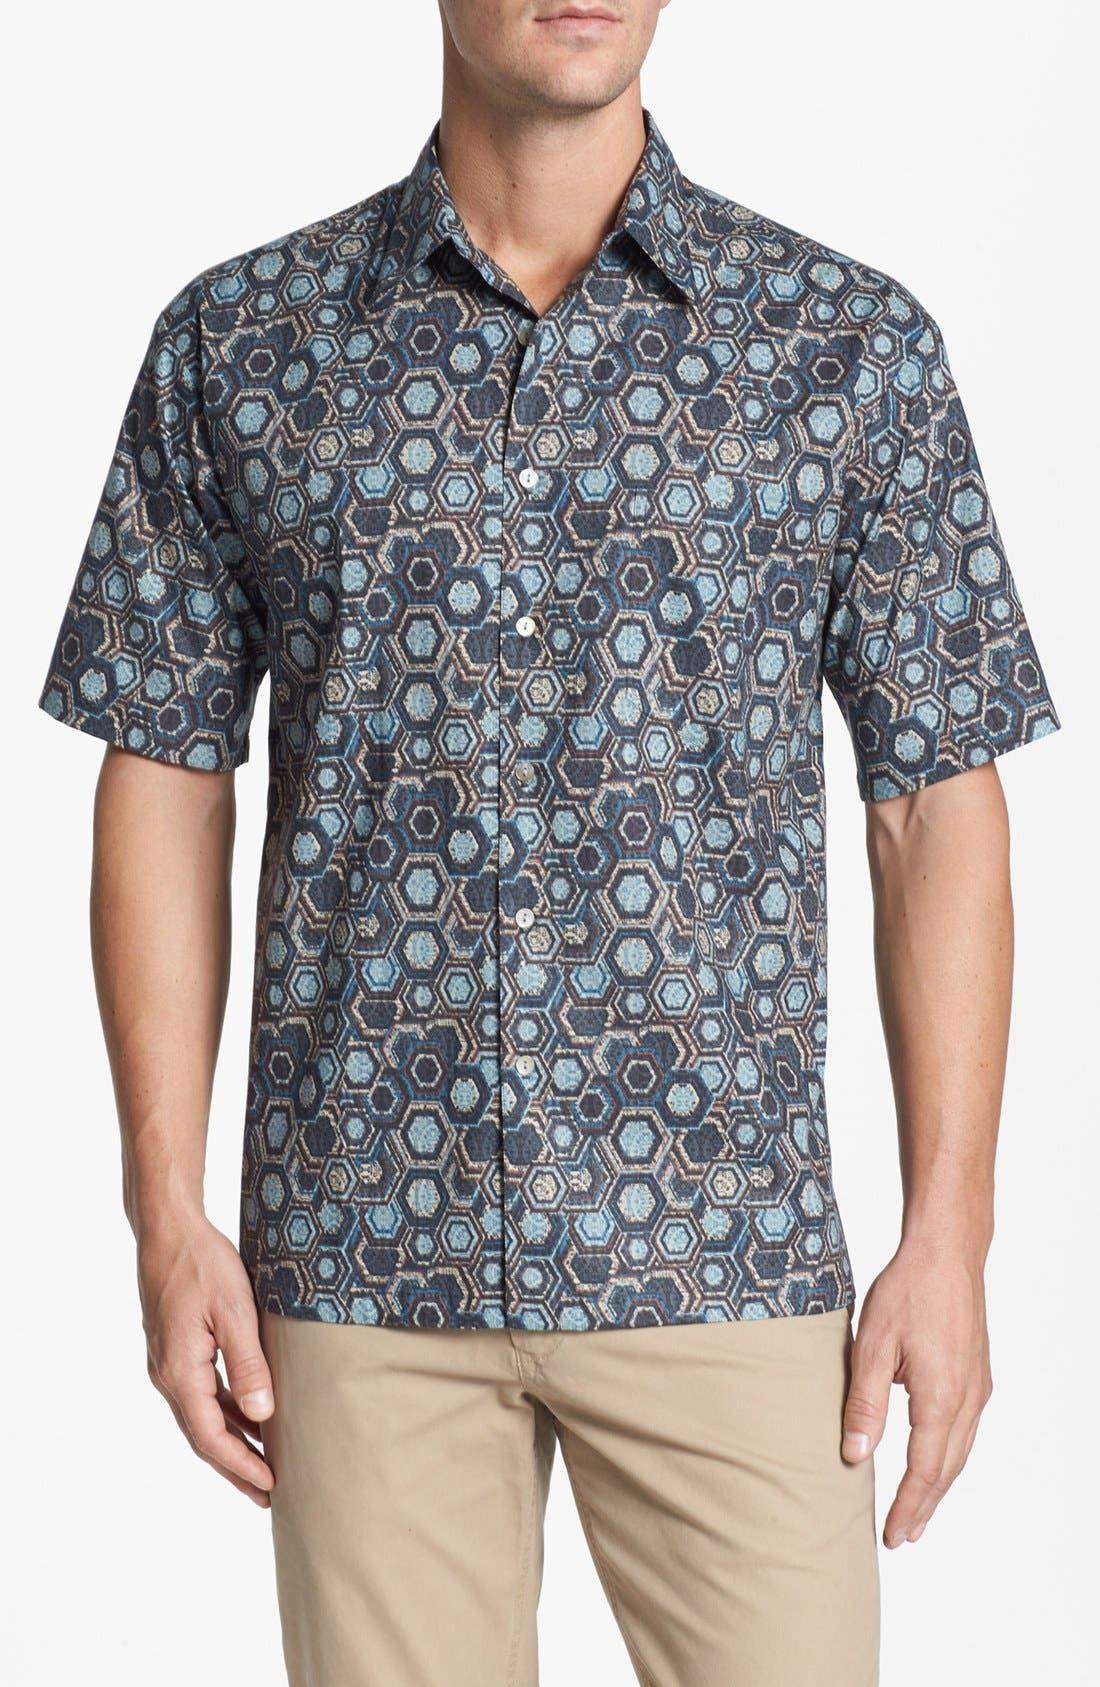 Alternate Image 1 Selected - Tori Richard 'Honeycomb II' Cotton Lawn Campshirt